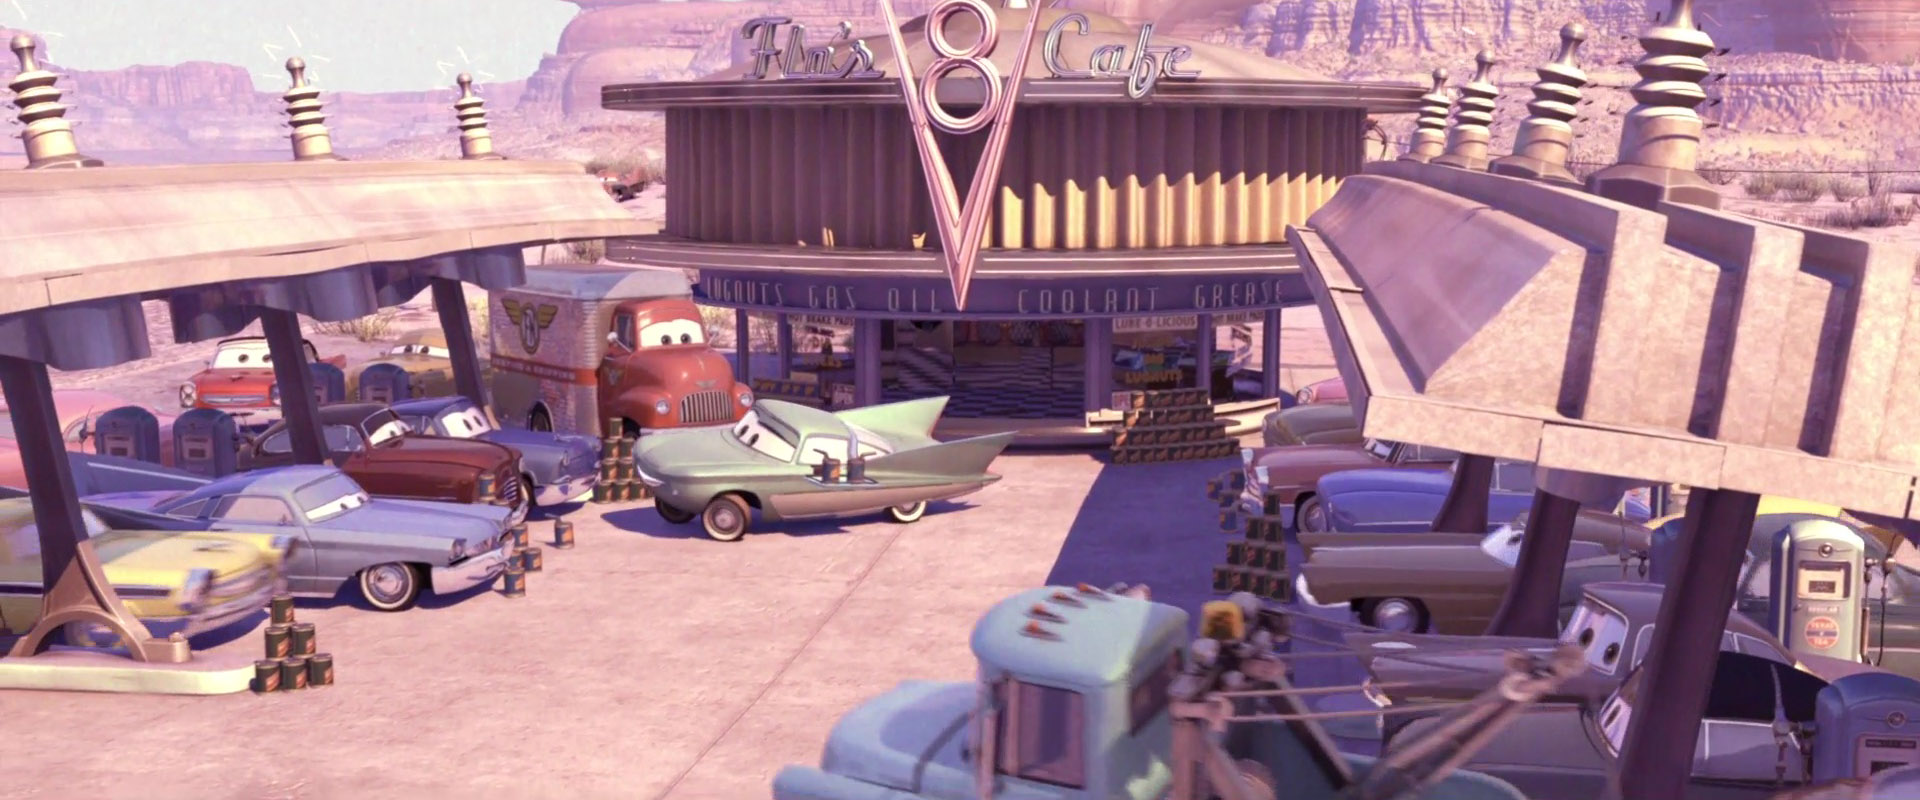 timothy timezone truecoat personnage character pixar disney cars